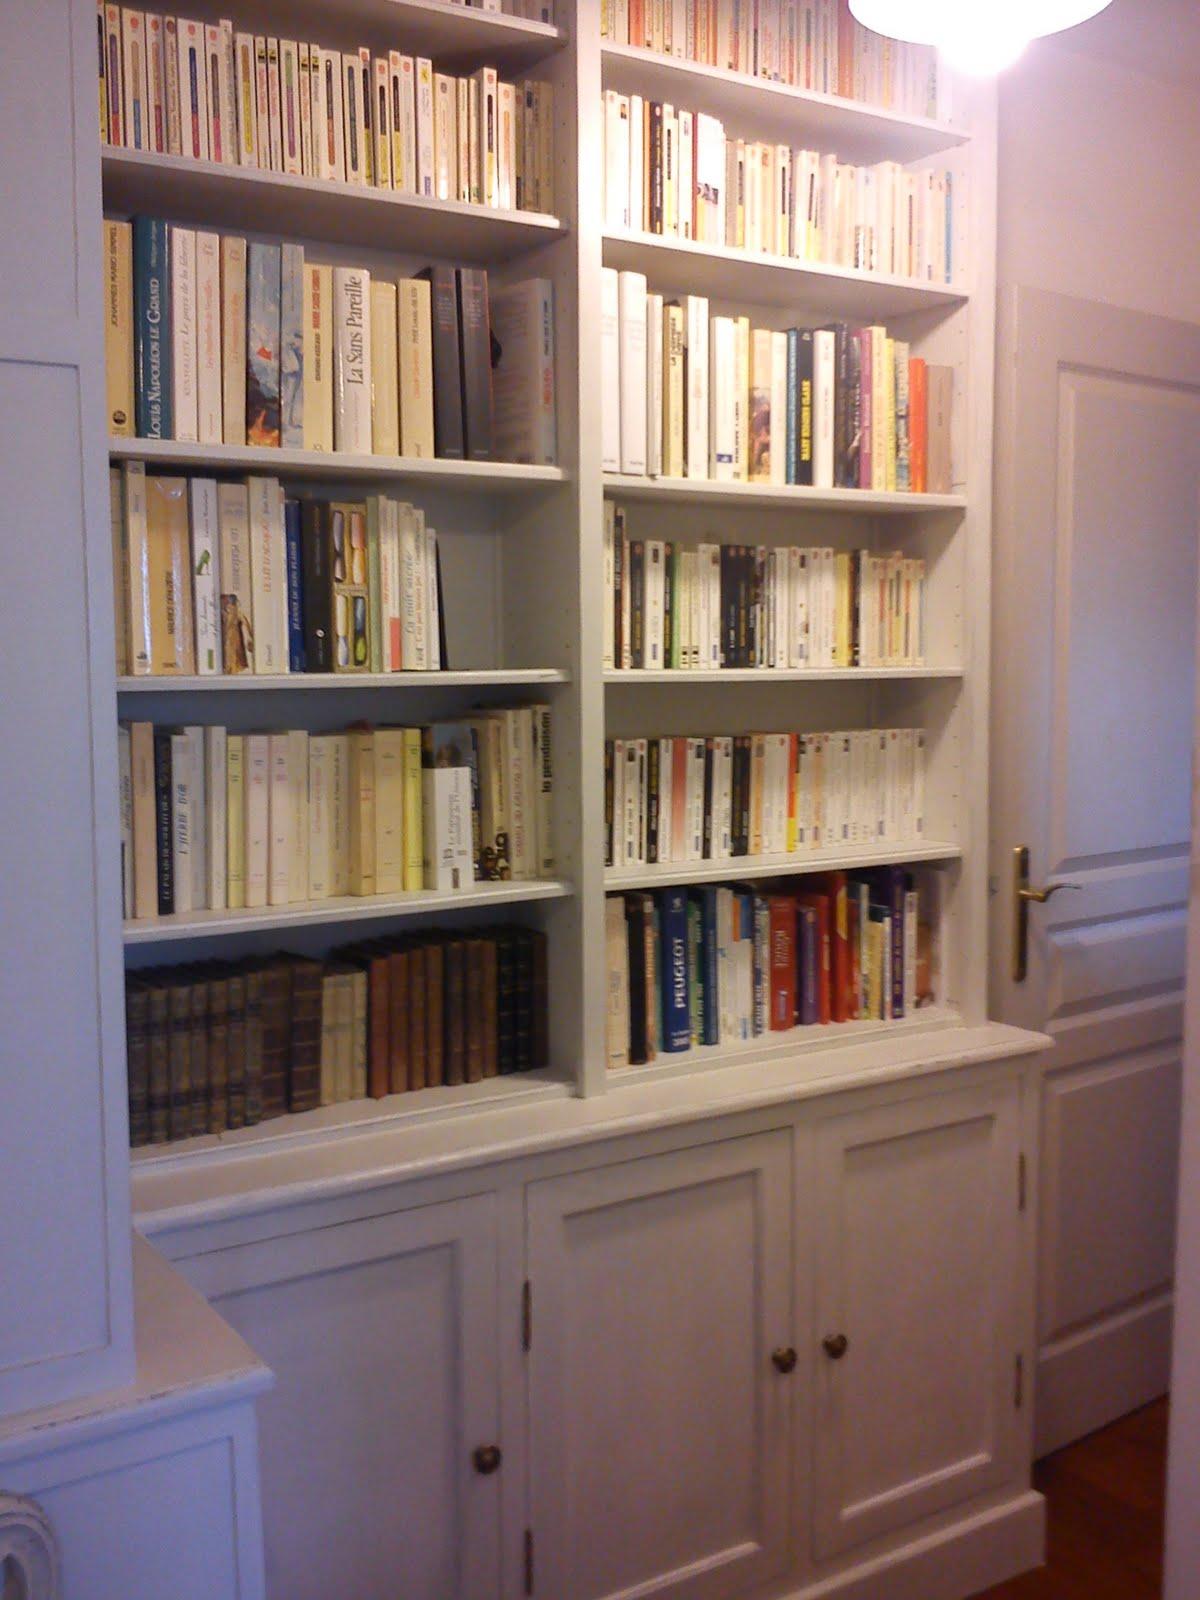 Dominique gilles eb niste bibliotheques - Bibliotheque en medium ...